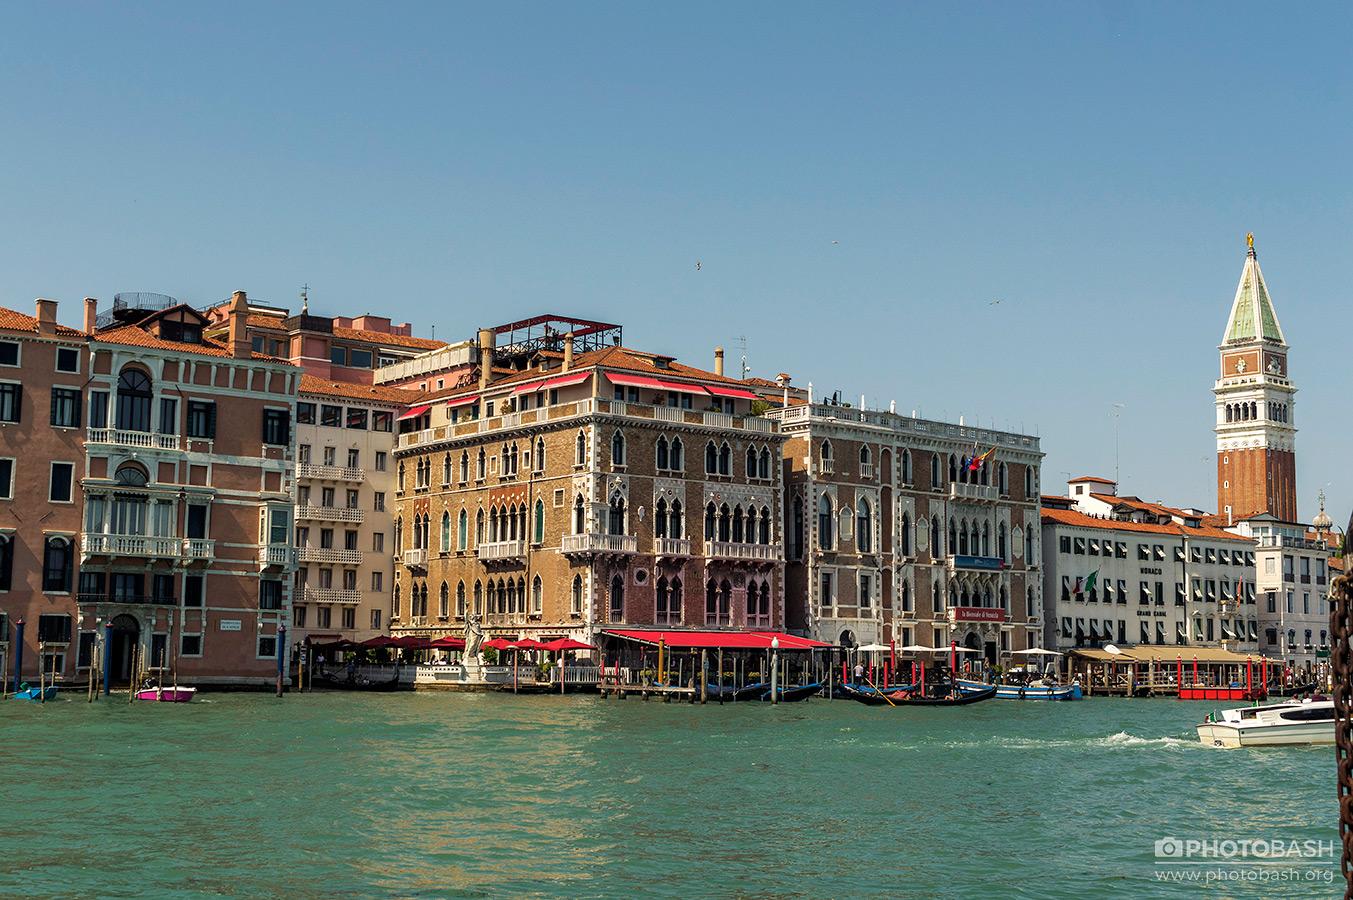 تصاویر رفرنس شهر ونیز ایتالیا